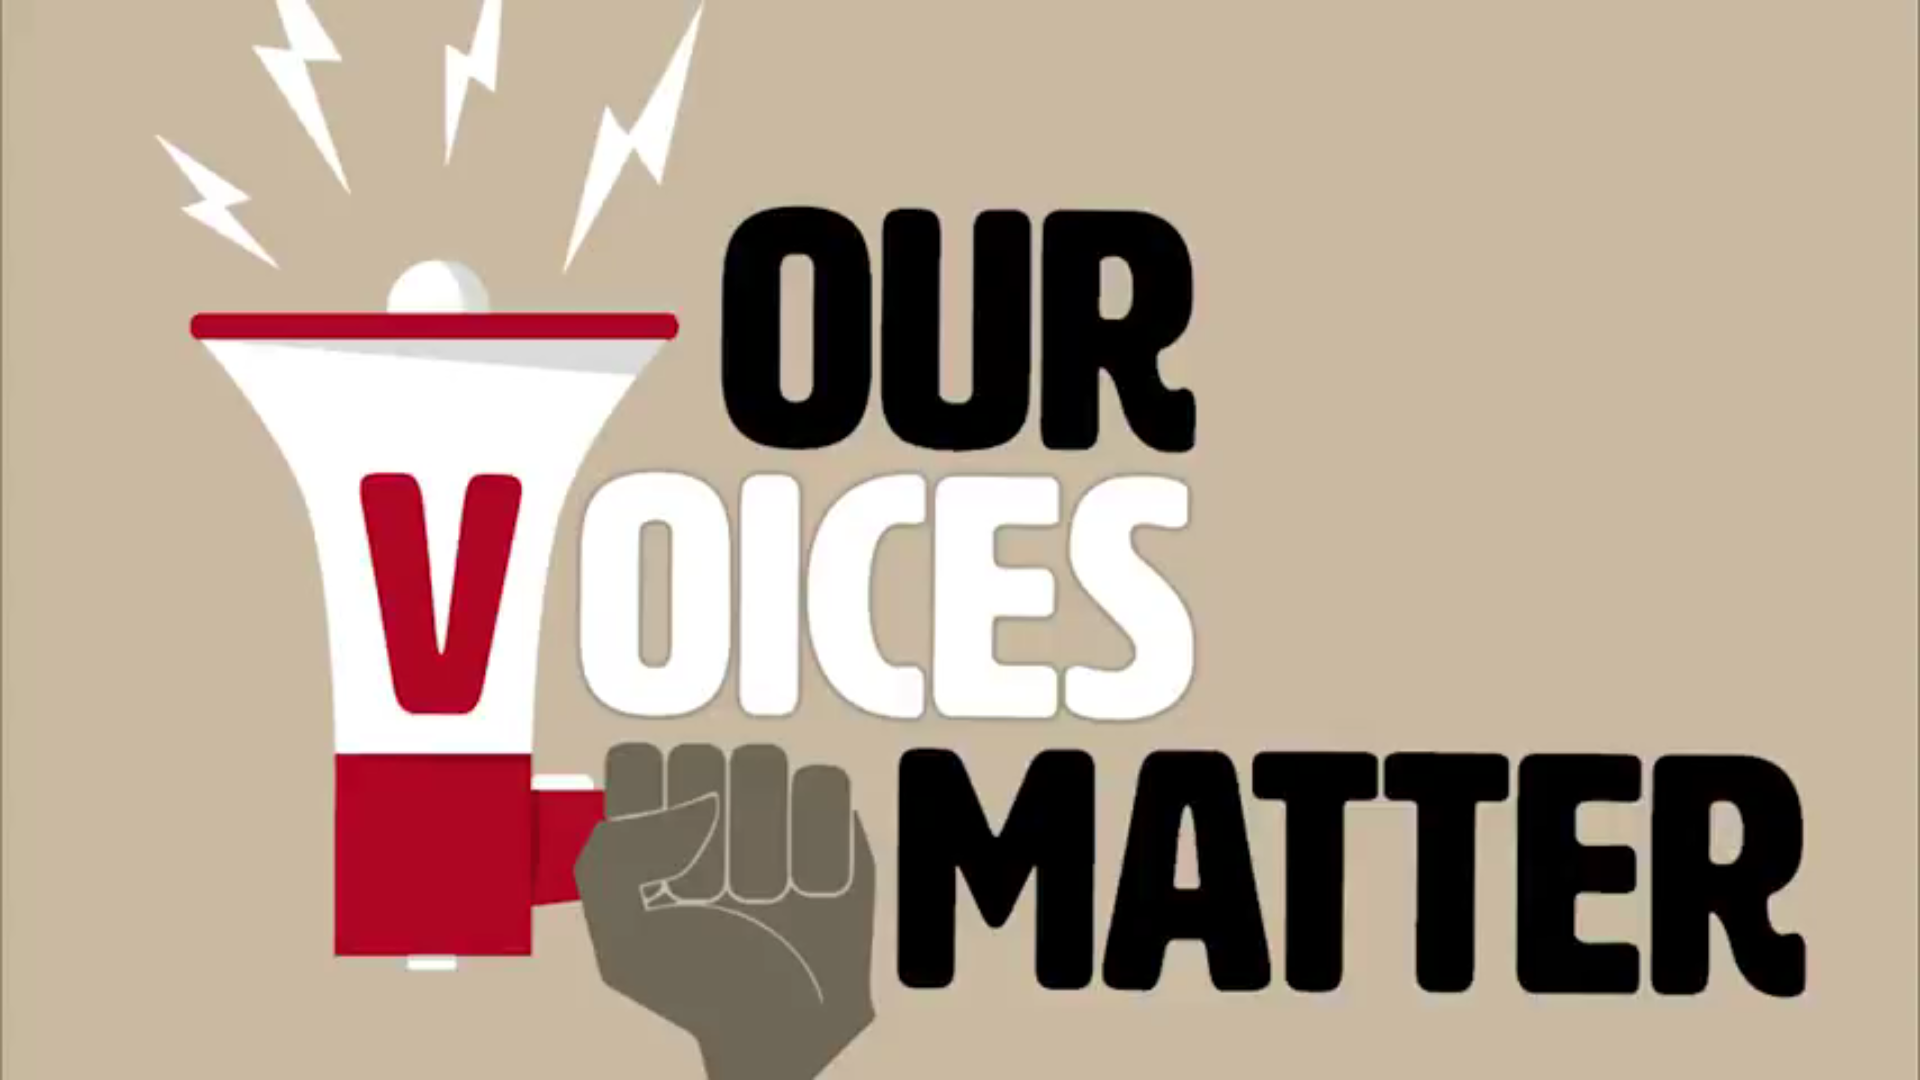 Our Voices Matter